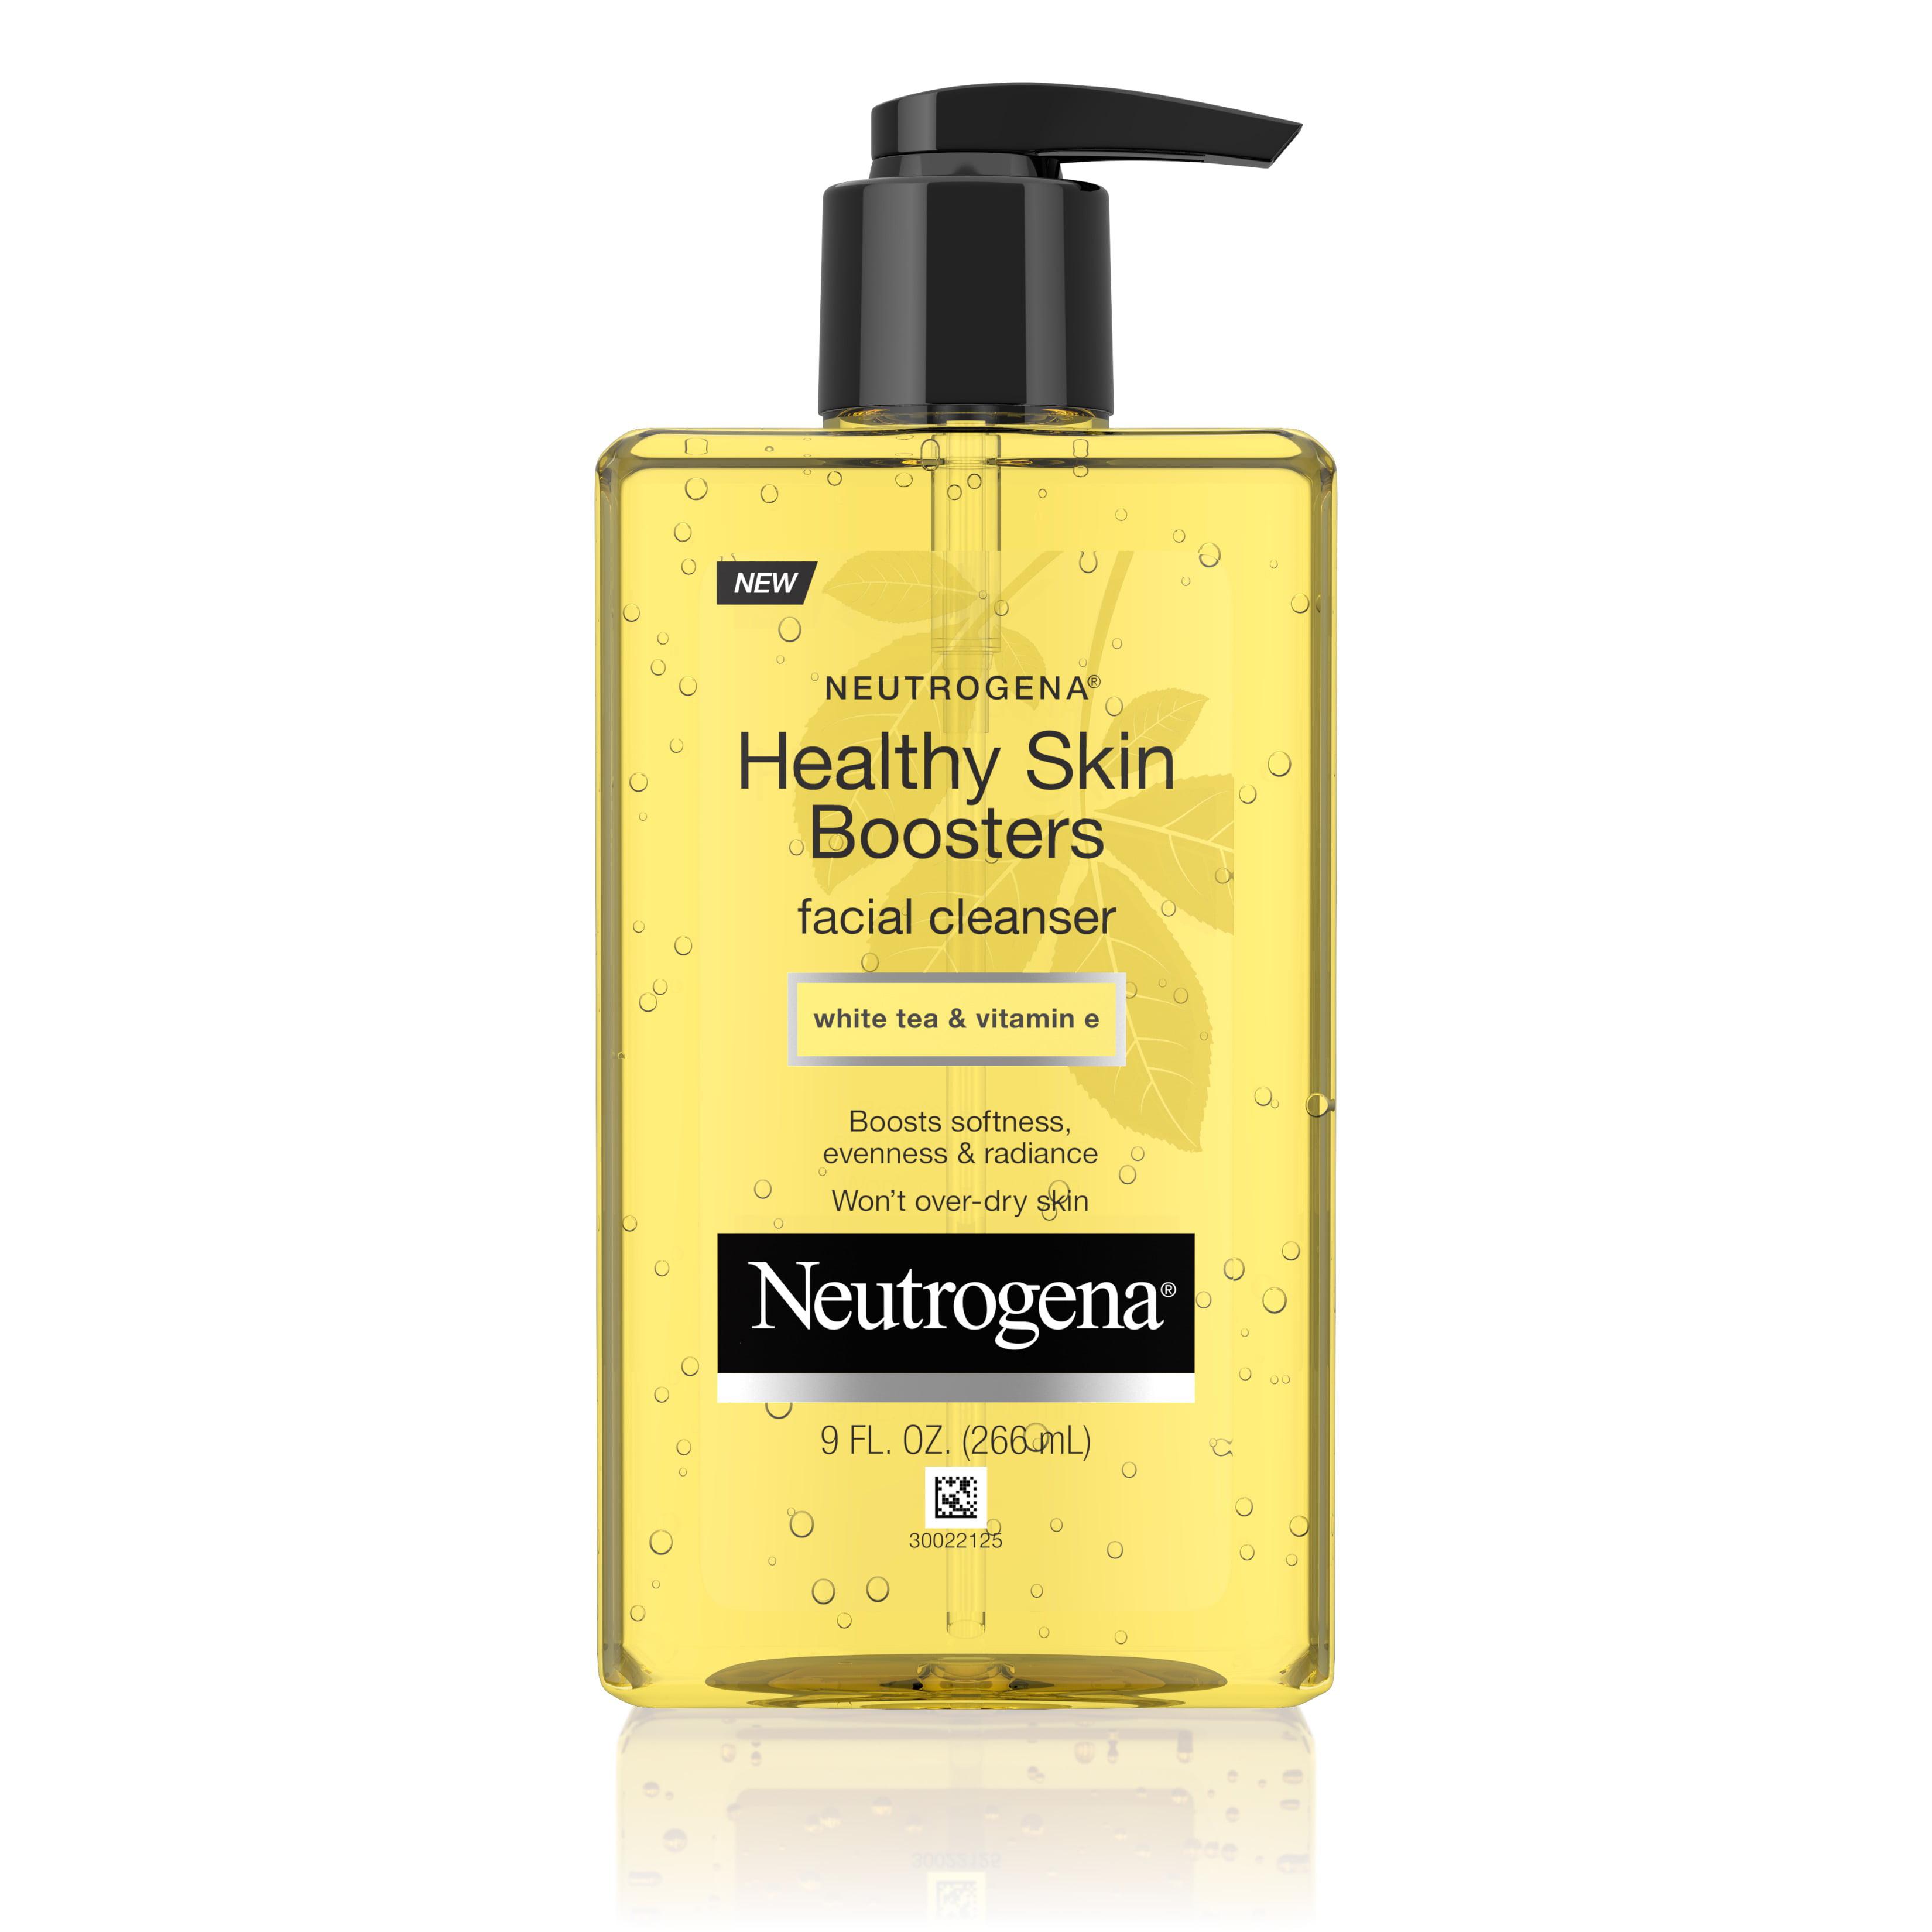 Neutrogena Healthy Skin Boosters Facial Cleanser, 9 Fl. Oz - Walmart.com